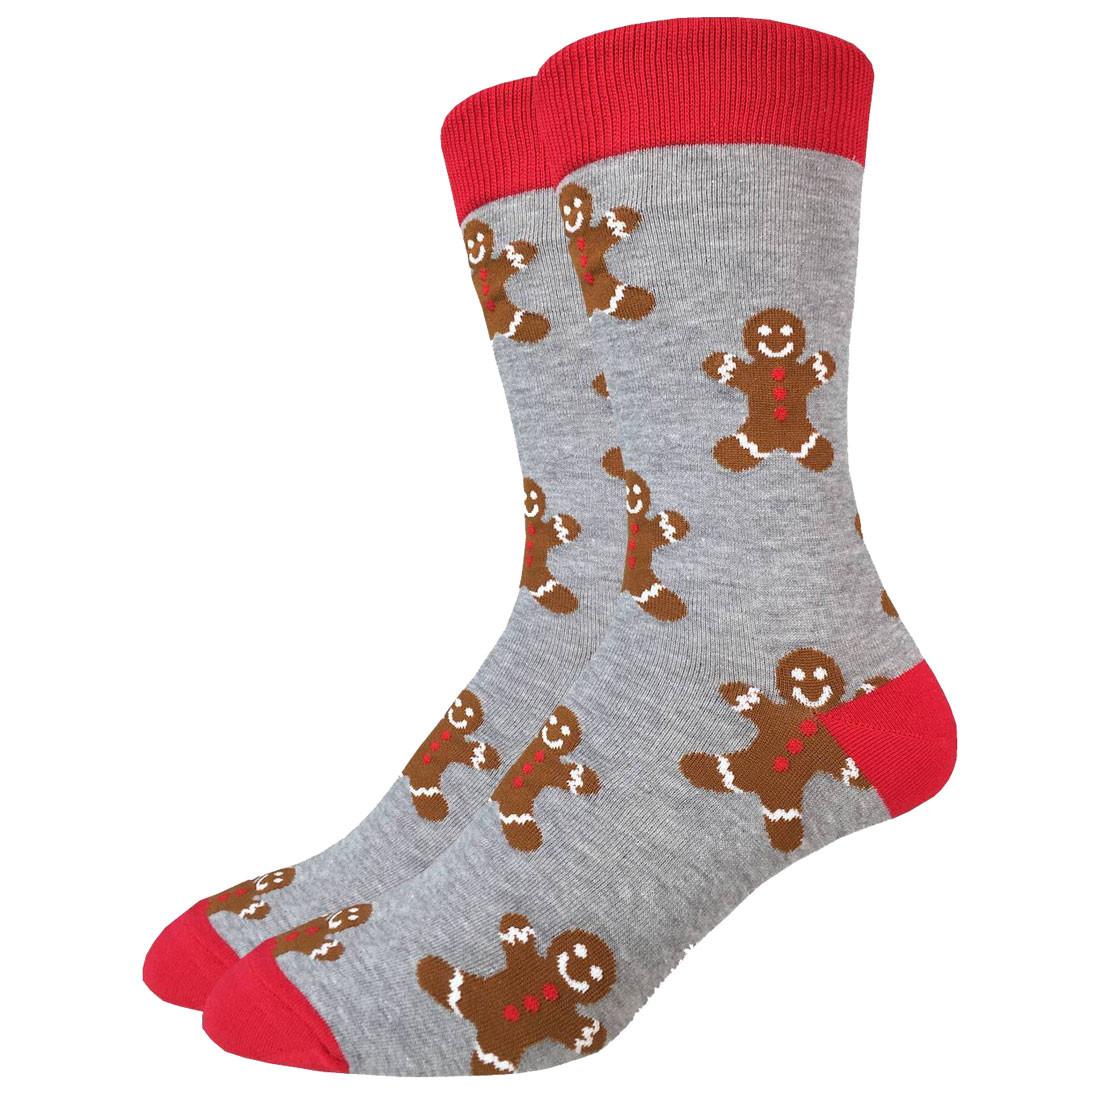 Men's Crew Socks Christmas Holiday Gingerbread Men